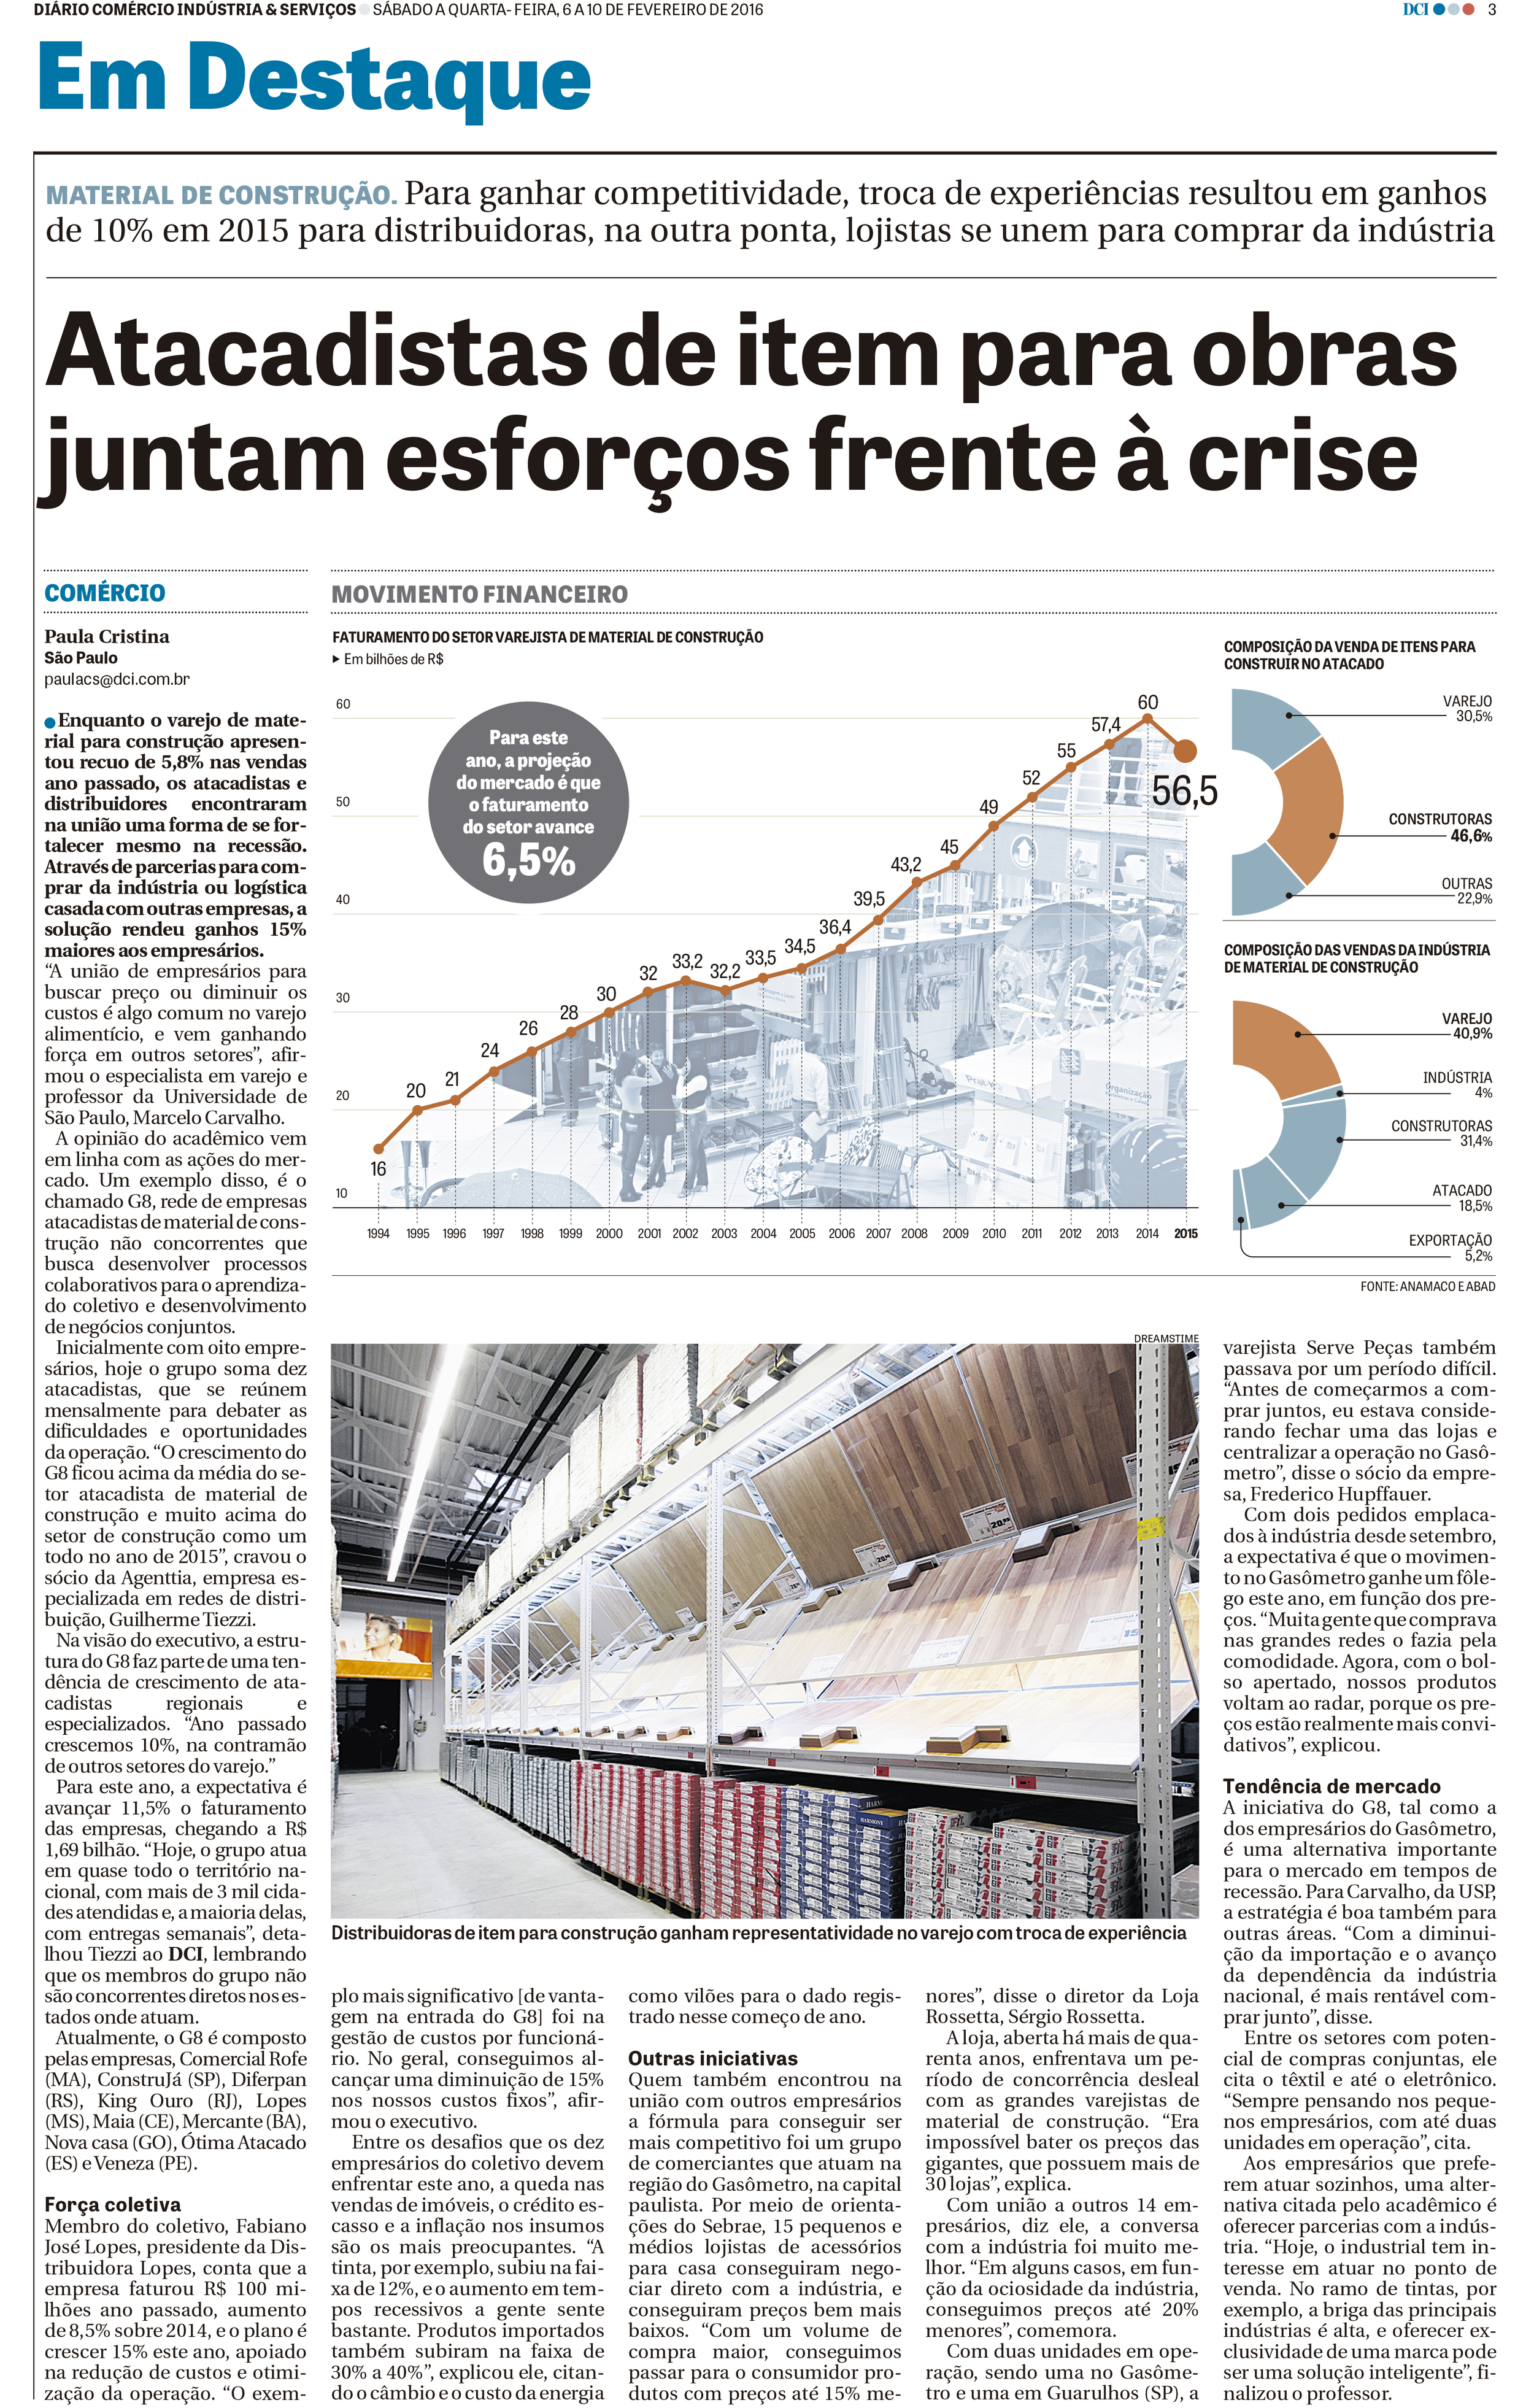 Jornal Impresso - DCI - 10/02/2016